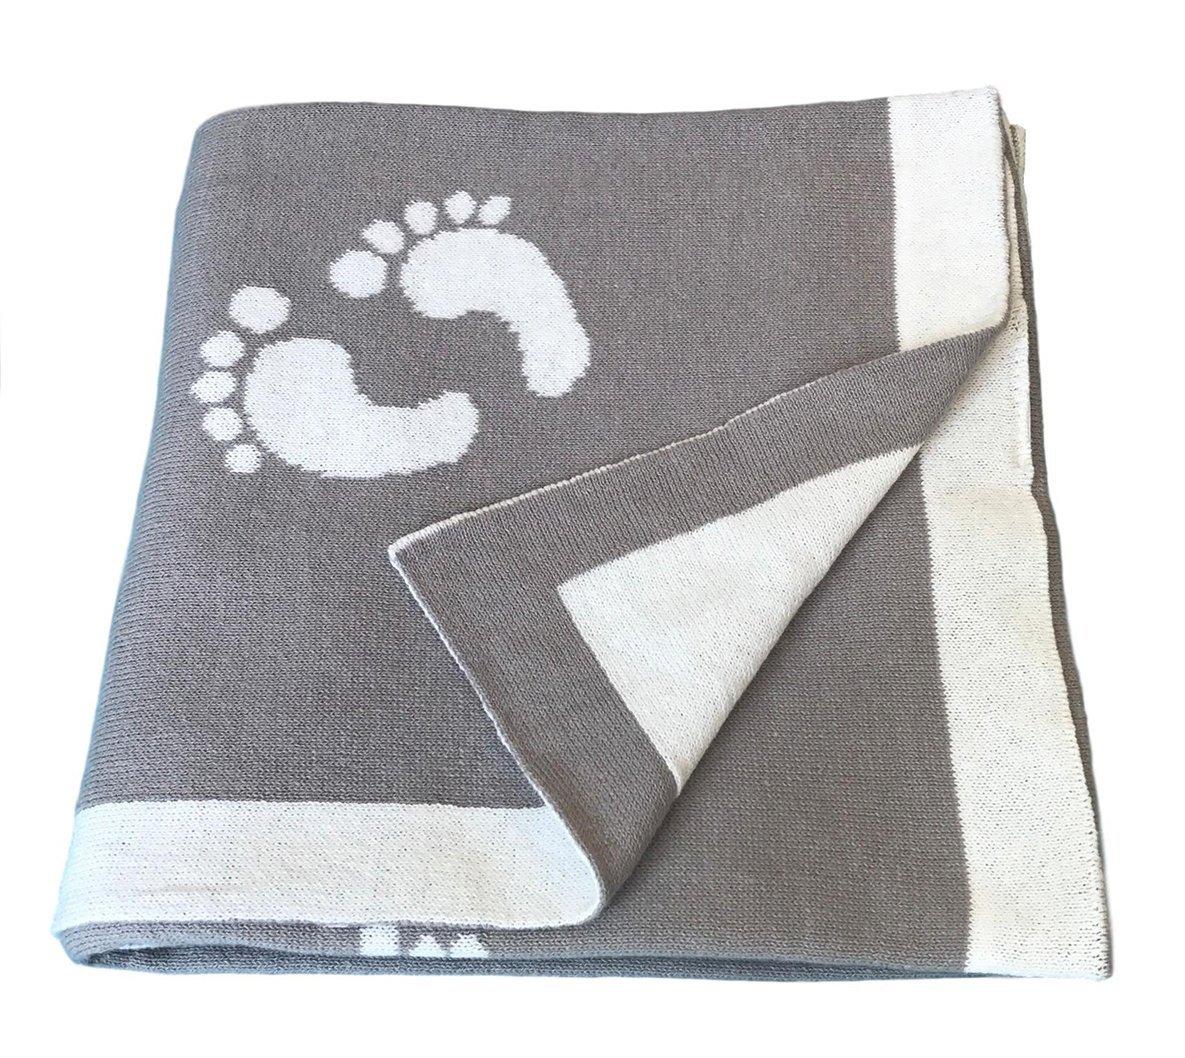 eb0b424e55c Get Quotations · Vogue 100% Cotton Knit Footprint Baby Blanket 30 x40